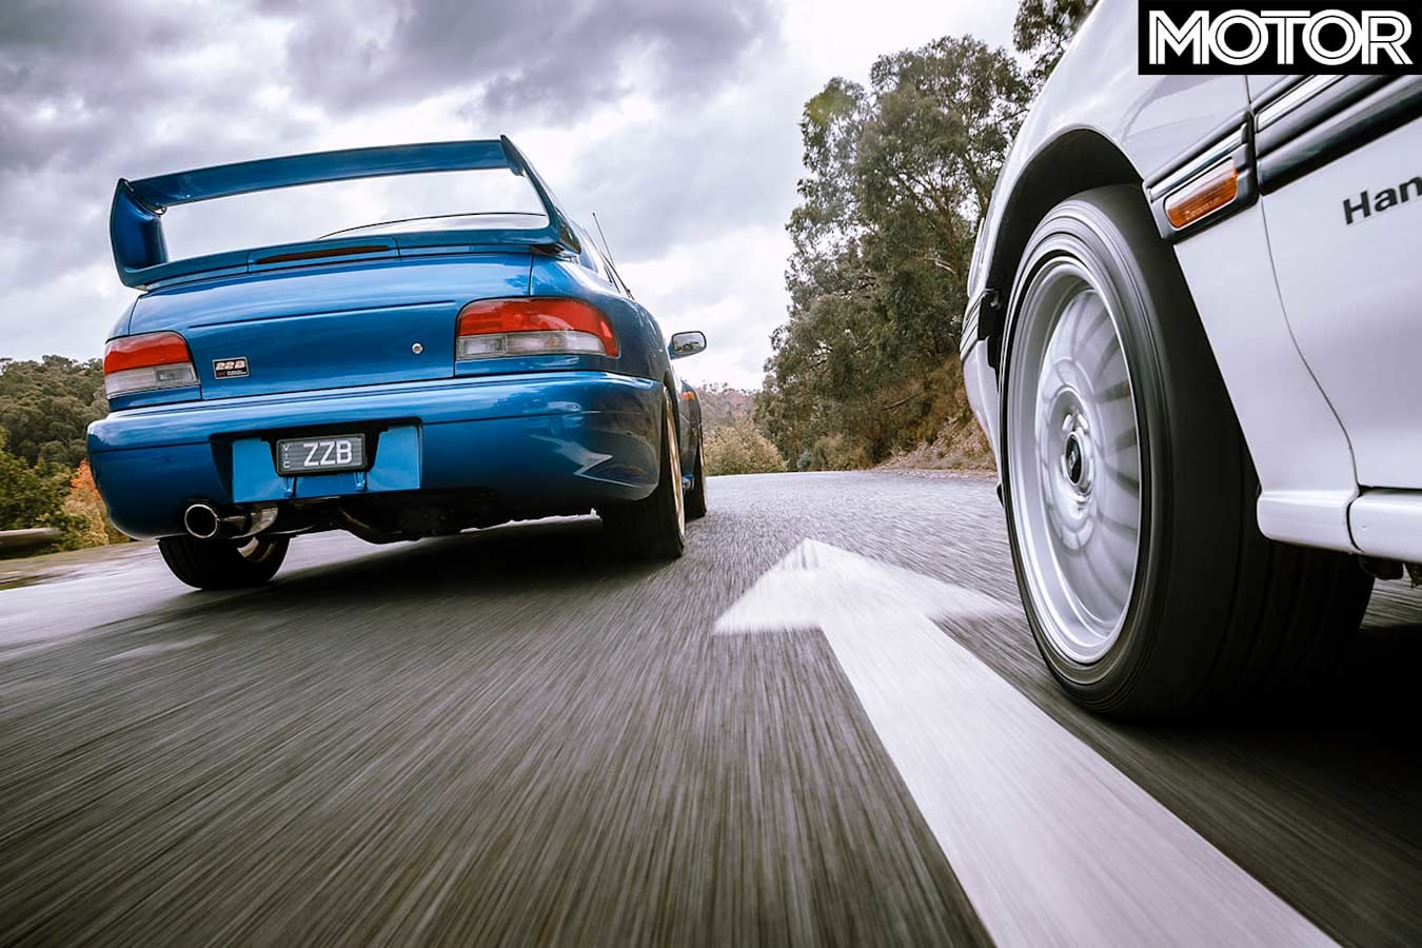 1998 Subaru Impreza WRX S Ti 22 B Performance Jpg